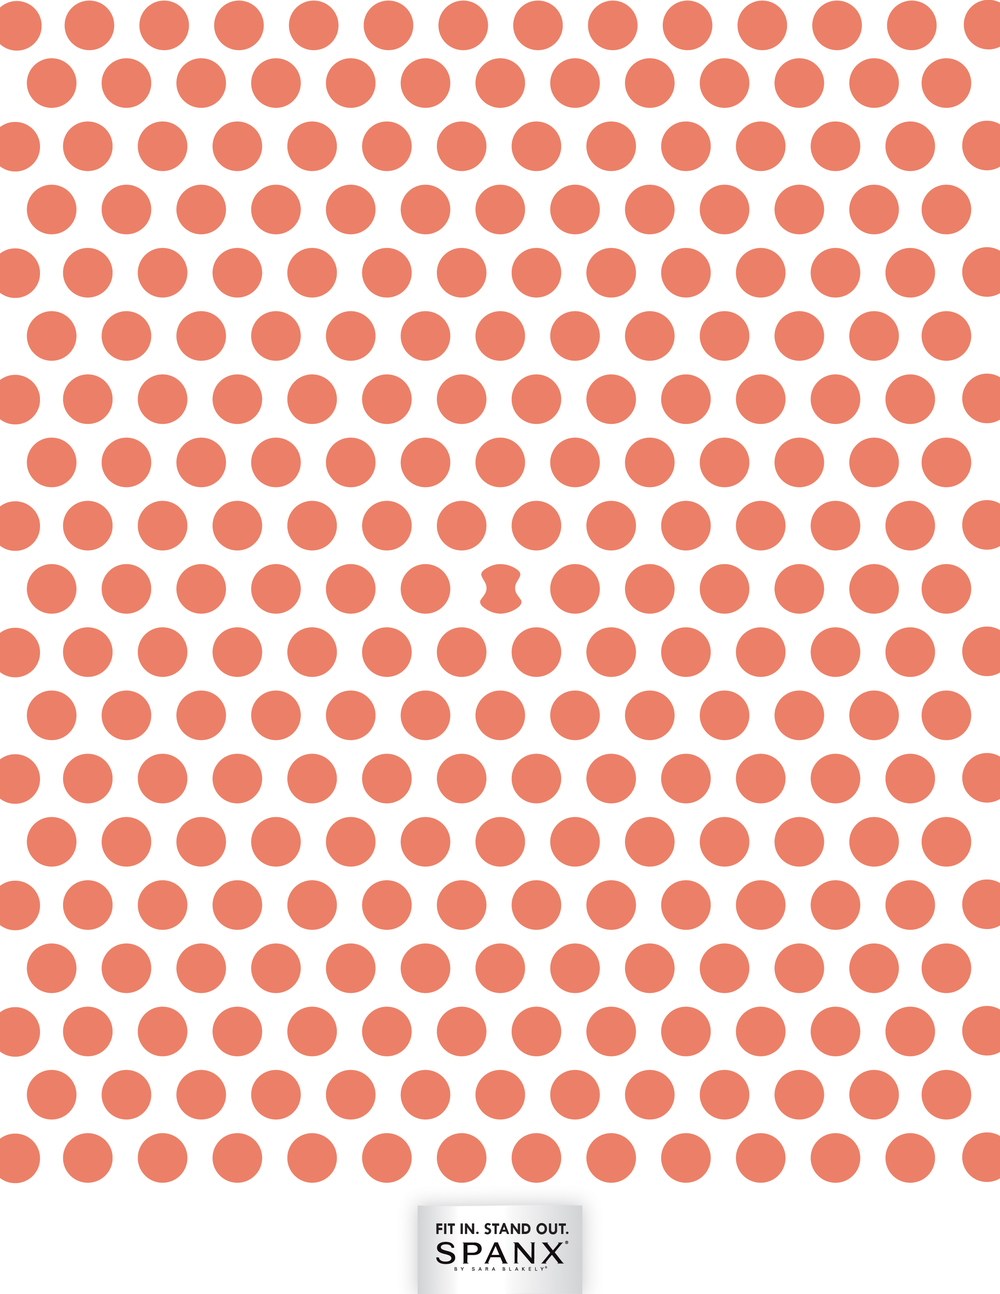 Spanx_Spring2014-01.jpg